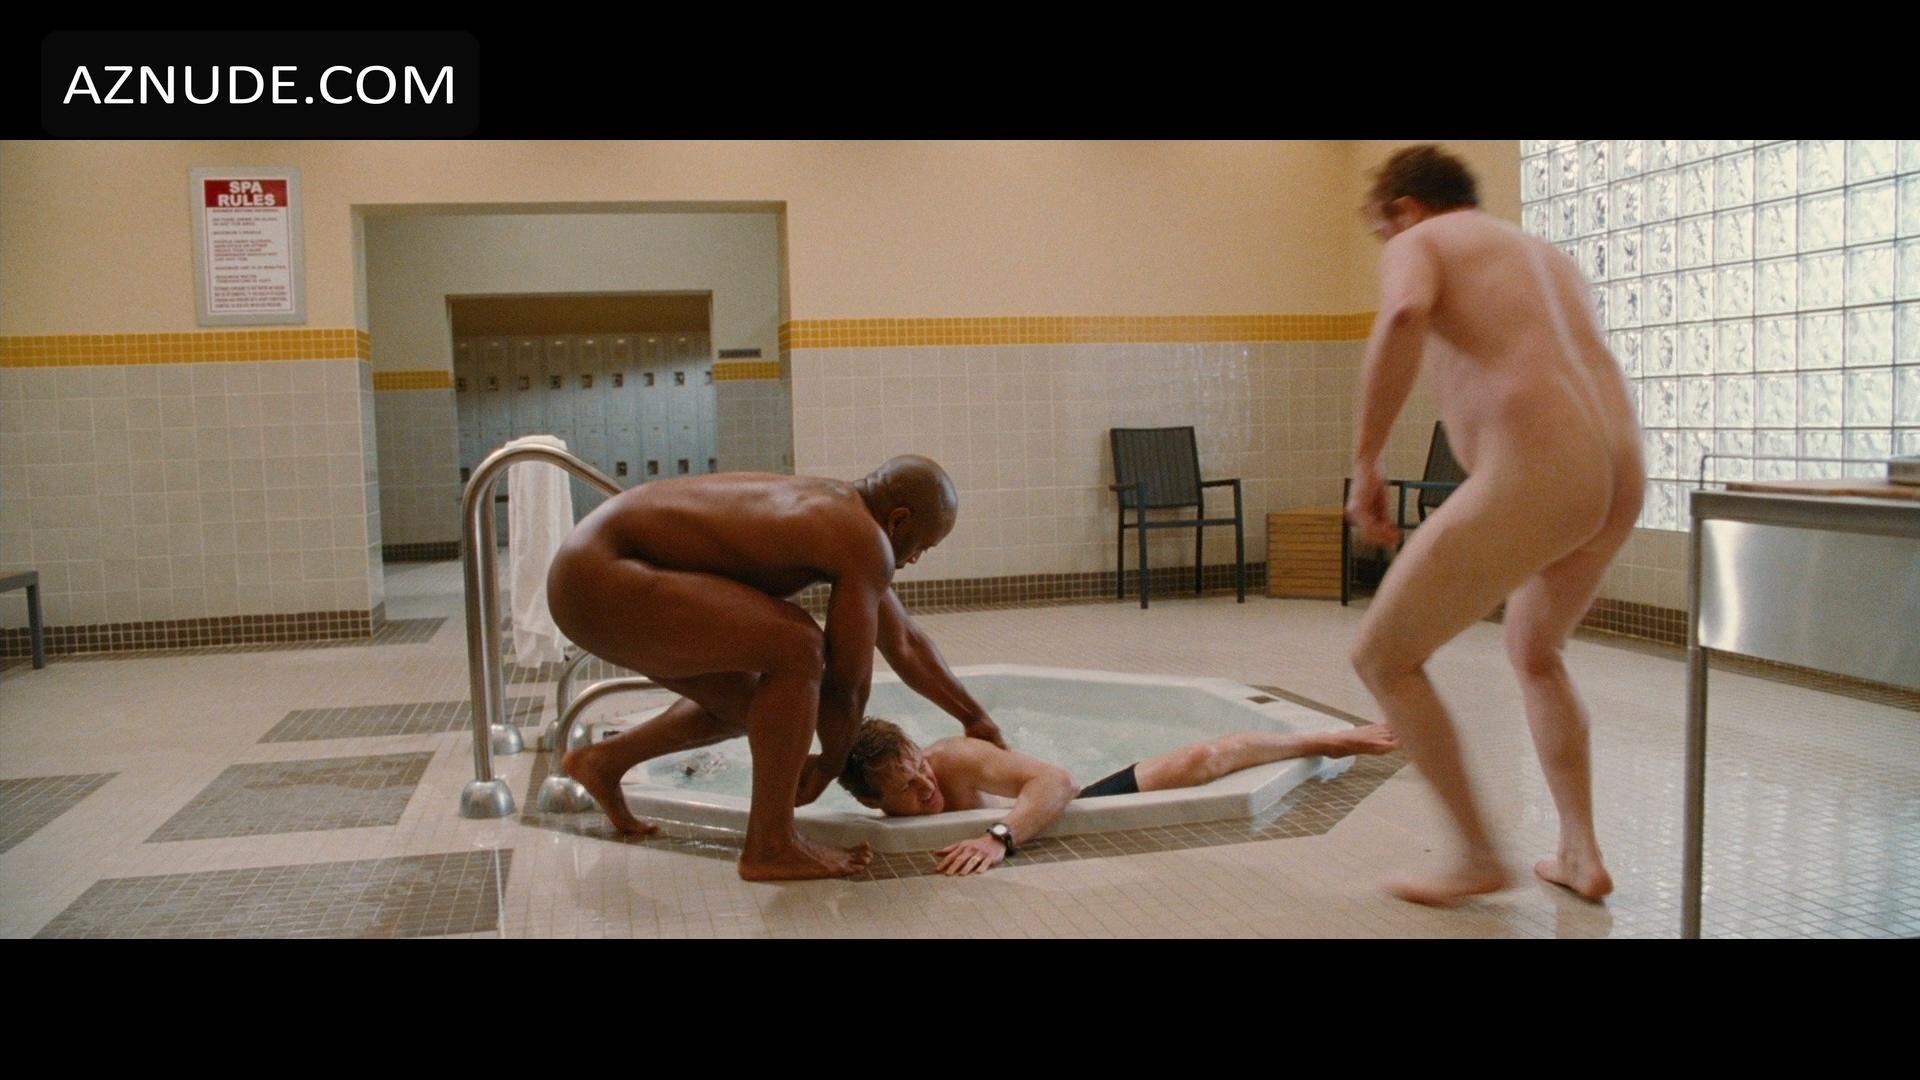 Watch hall pass nude scene